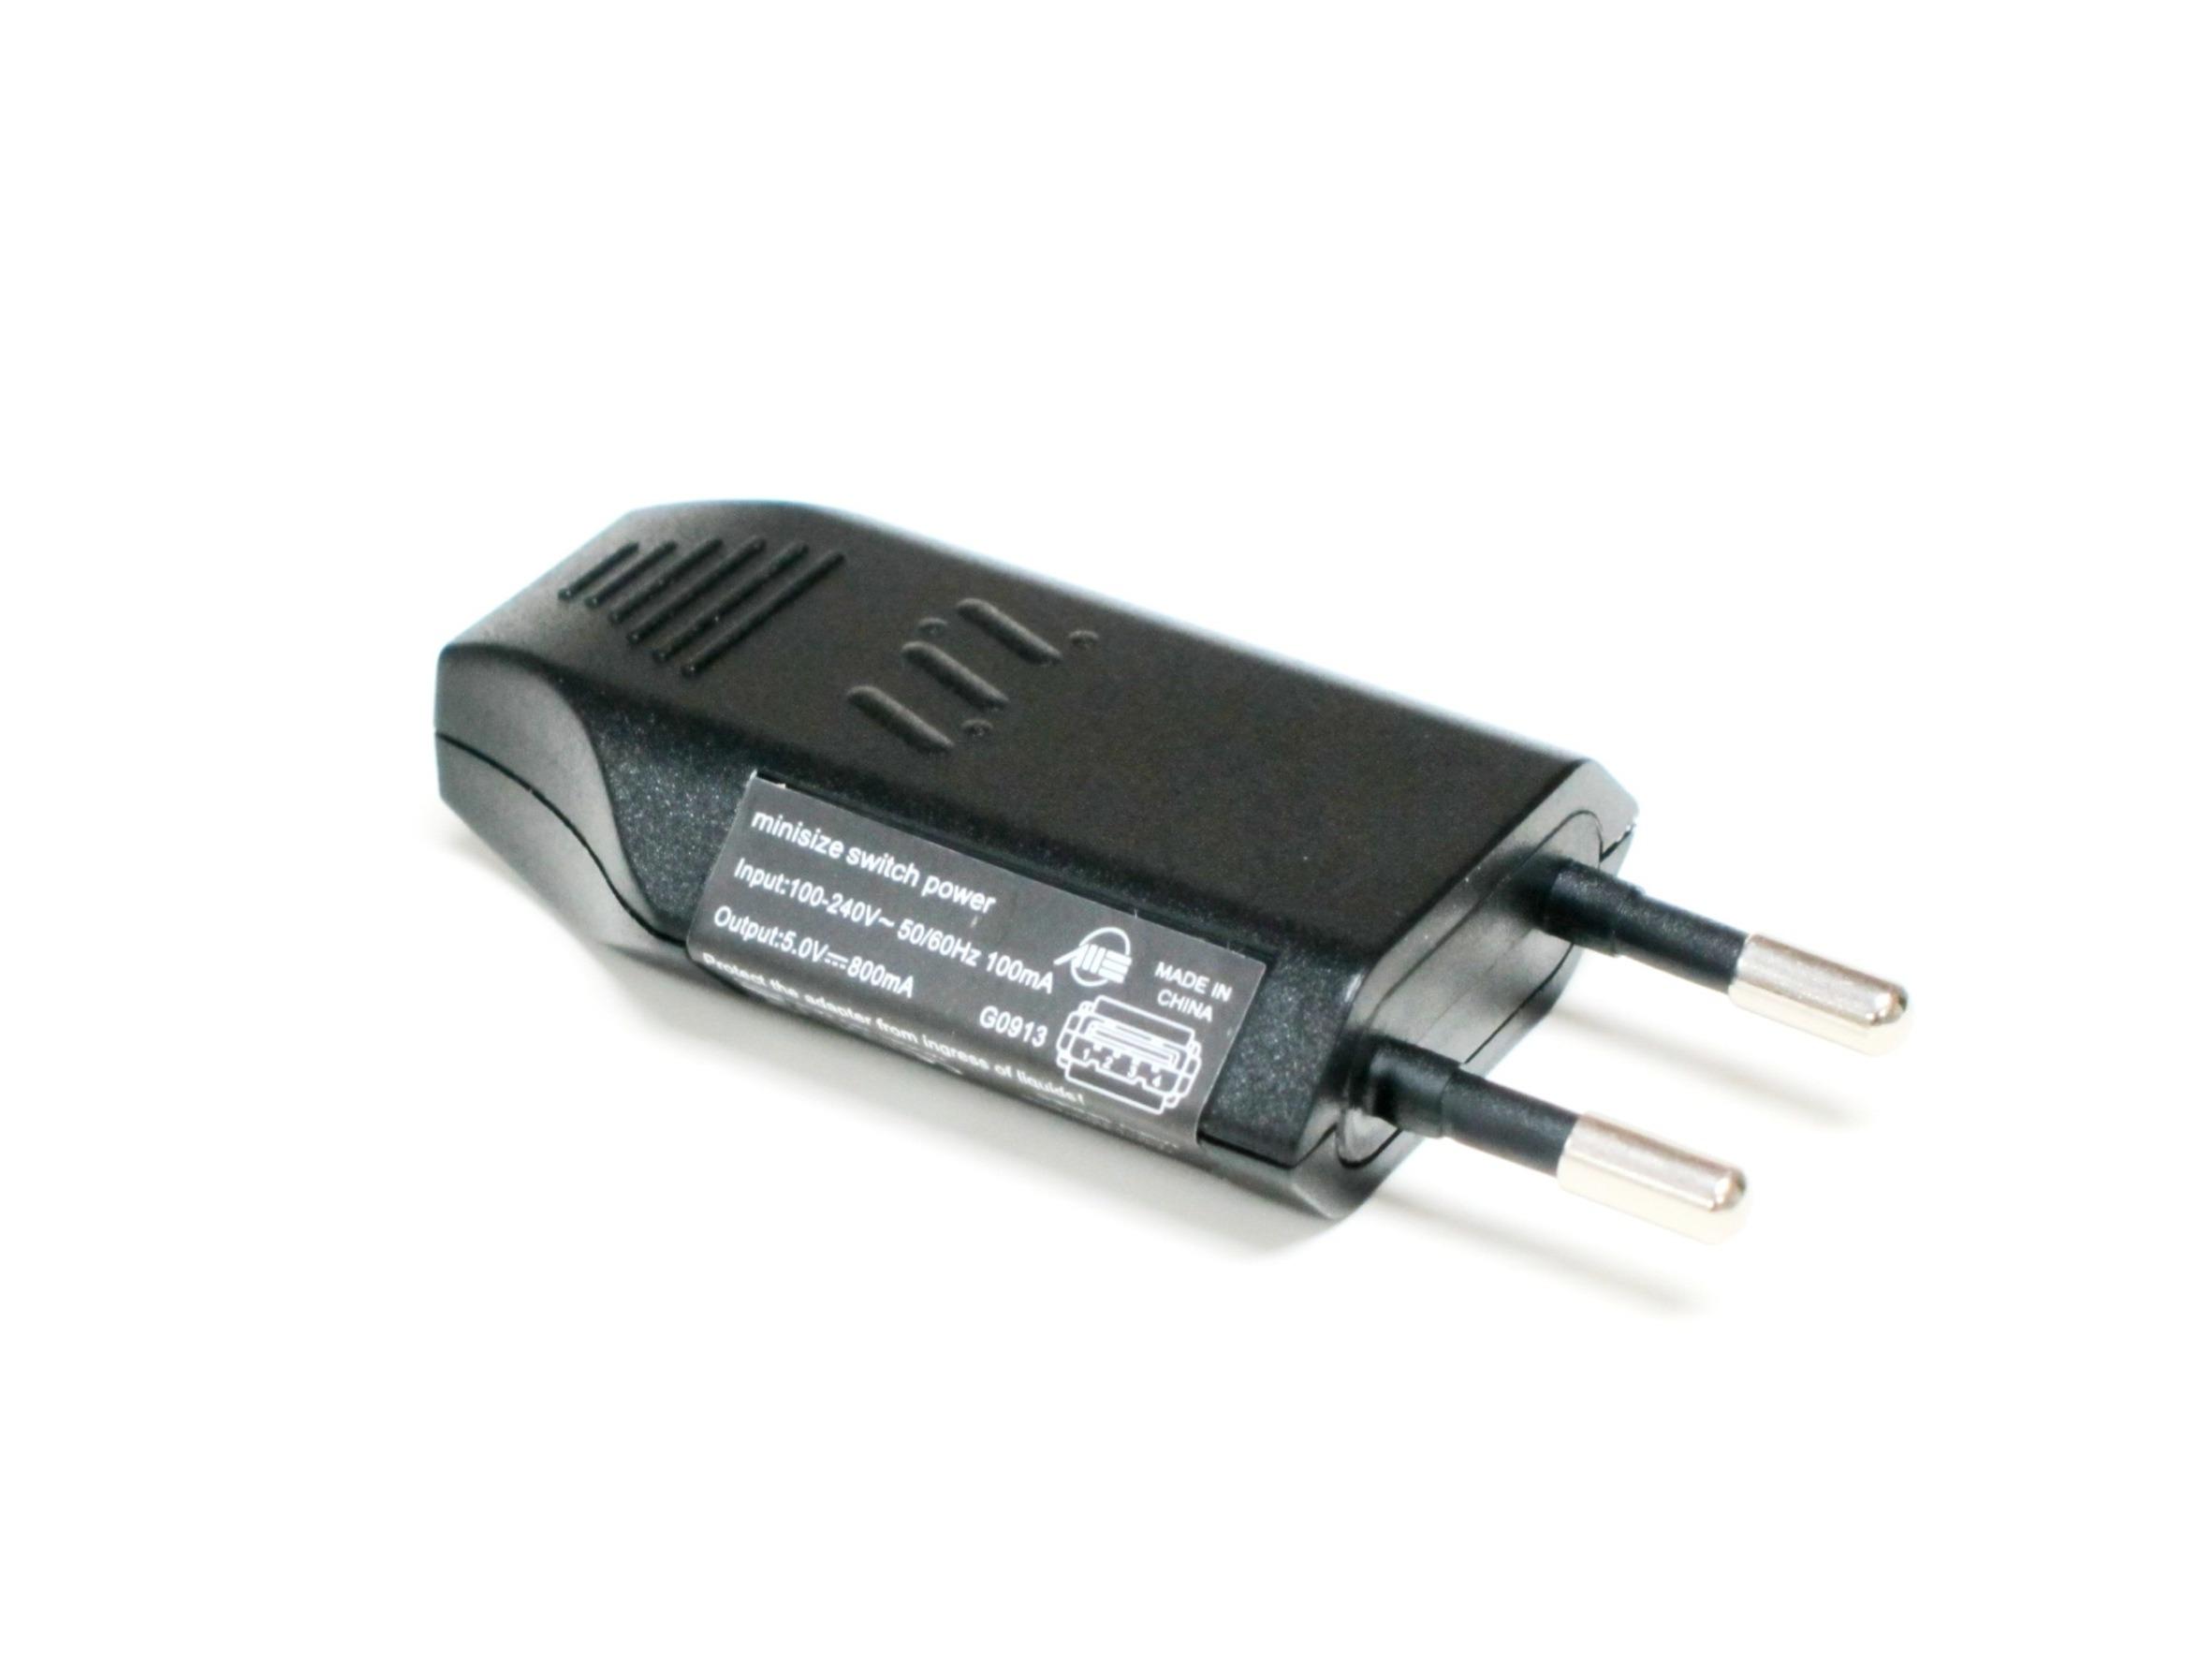 Usb power adapter pakistan